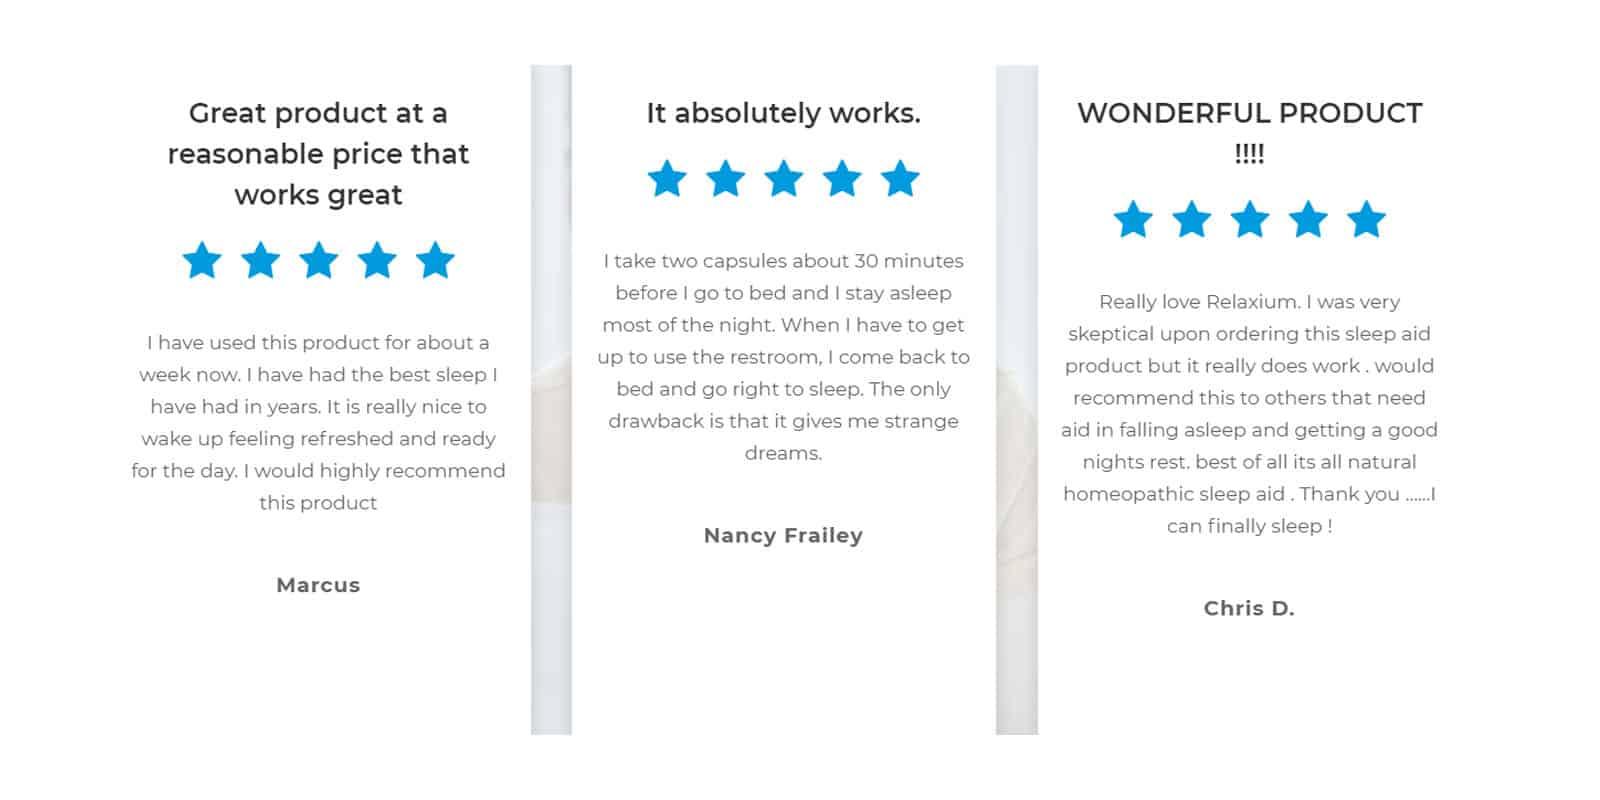 Relaxium Sleep Customer Reviews